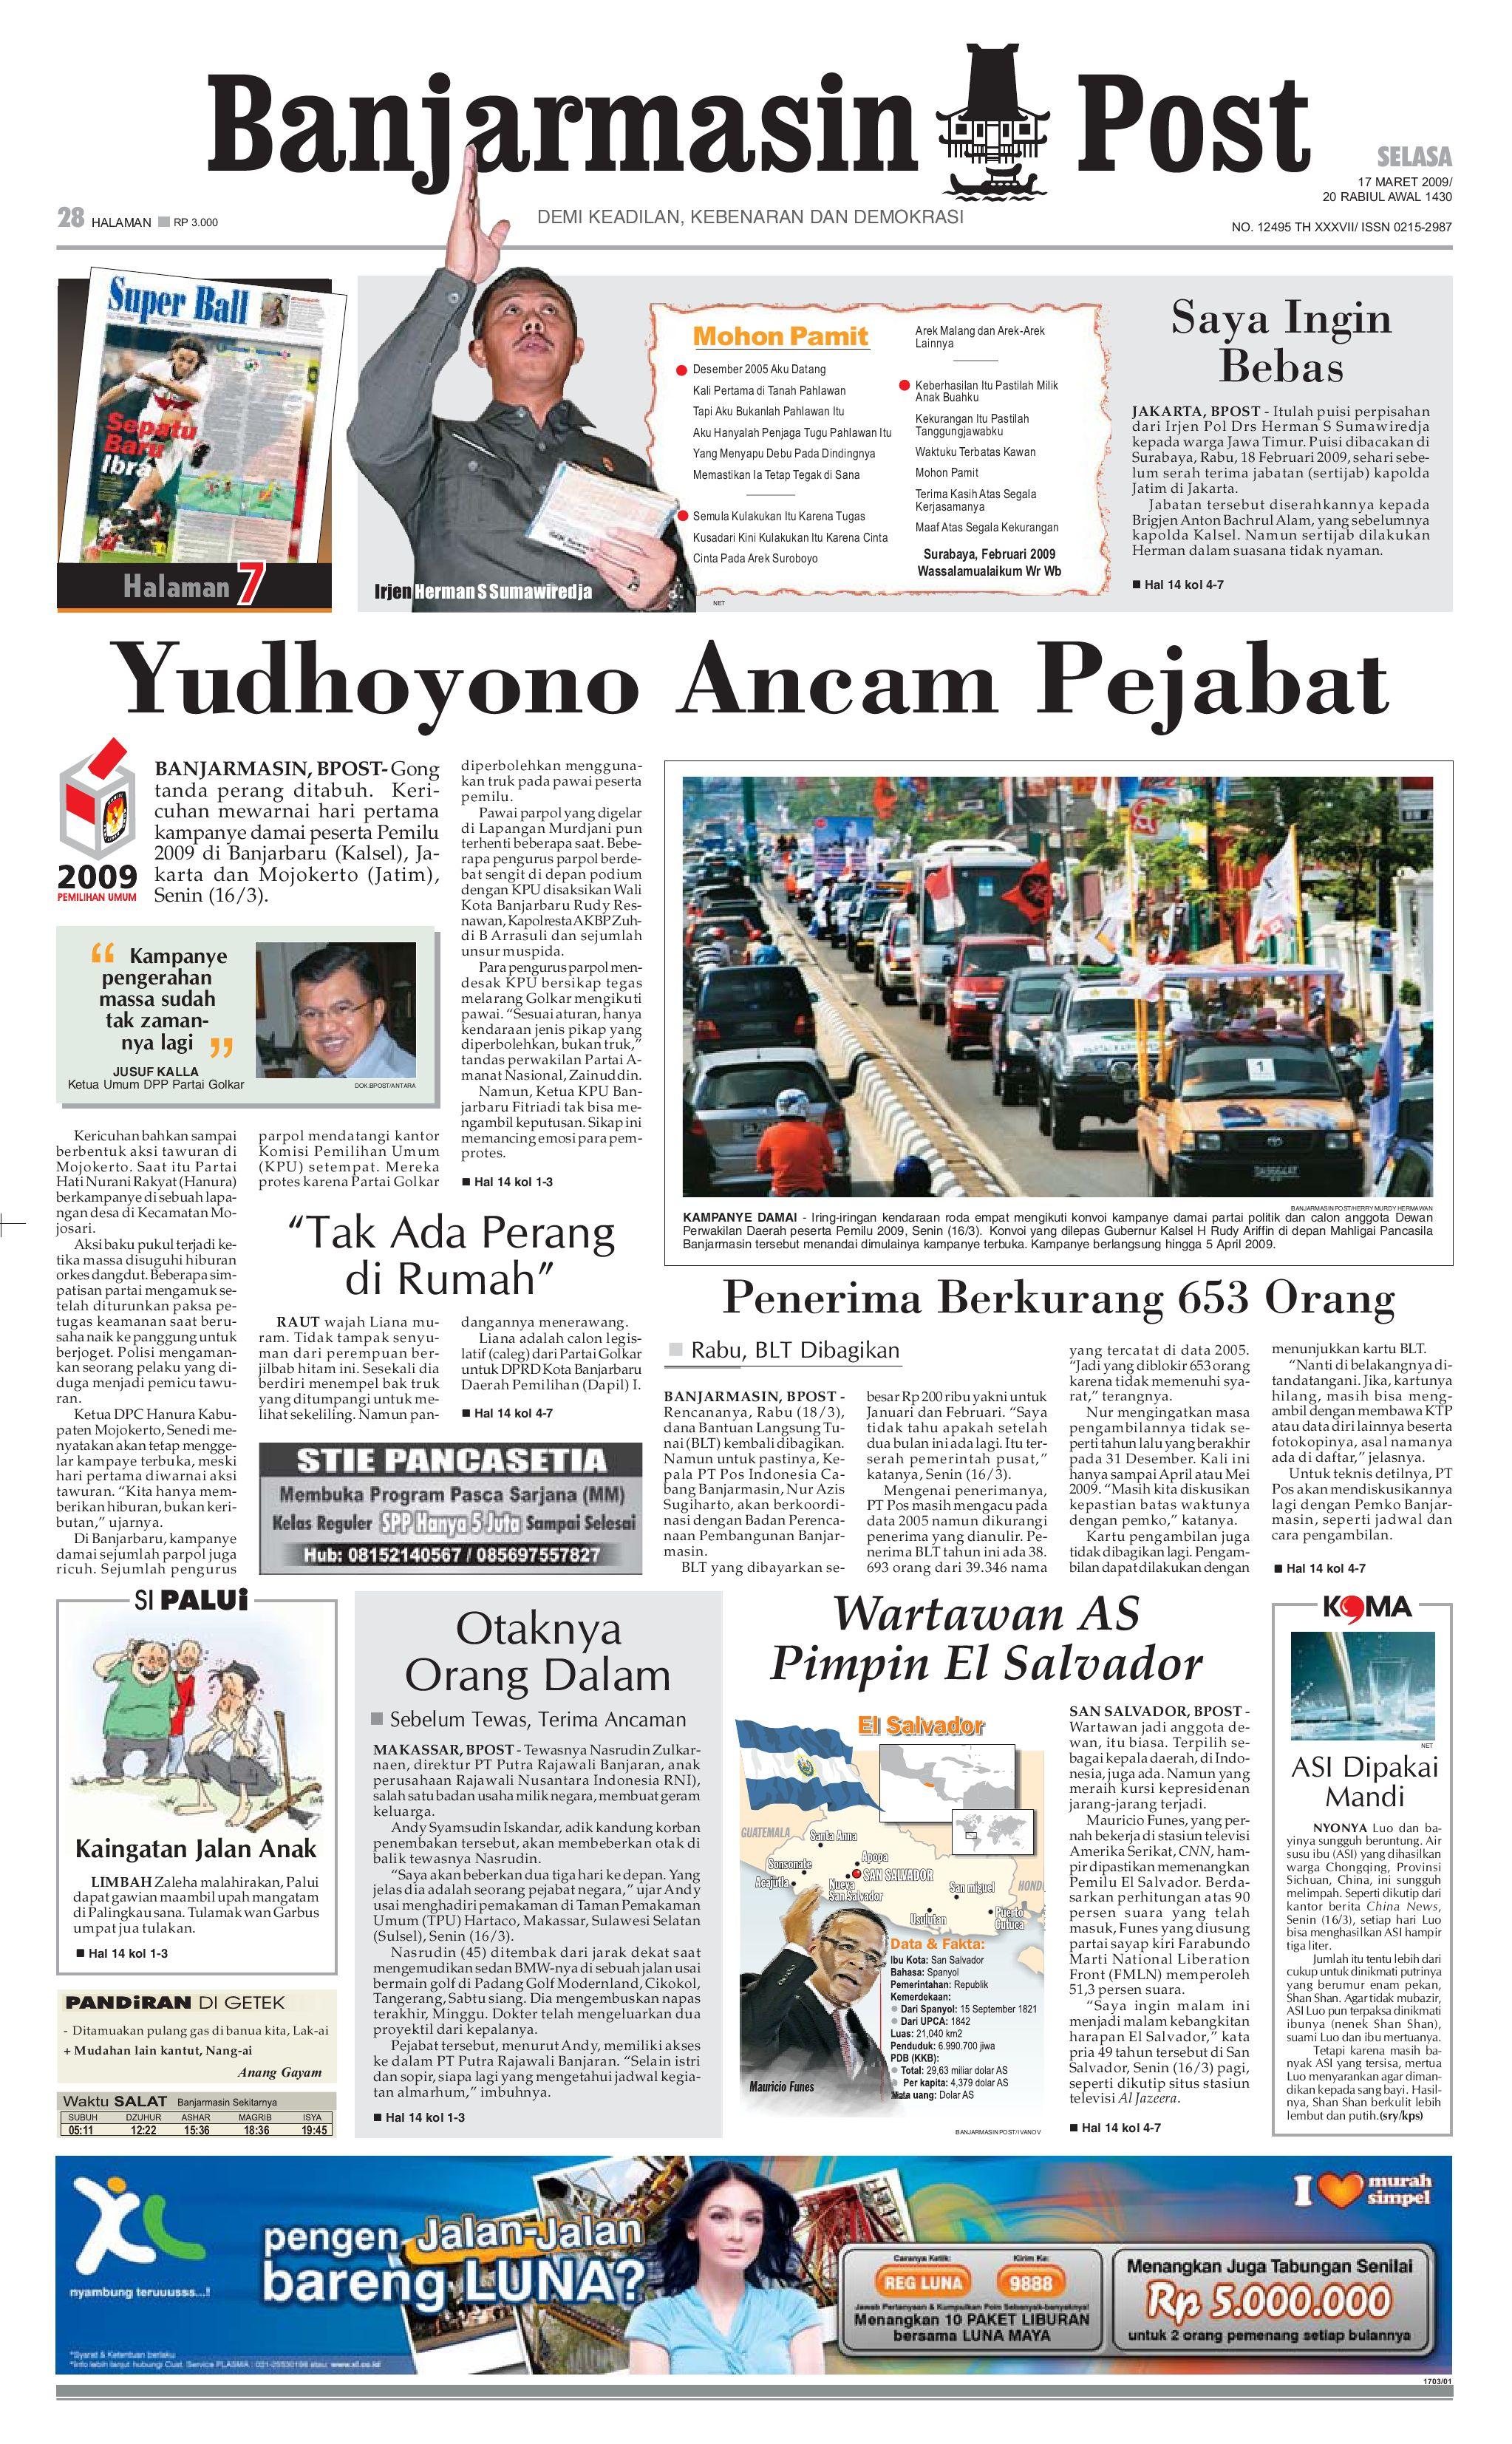 Banjarmasin Post 17 Maret 2009 By Issuu Produk Ukm Bumn Tekiro Tang Buaya 10